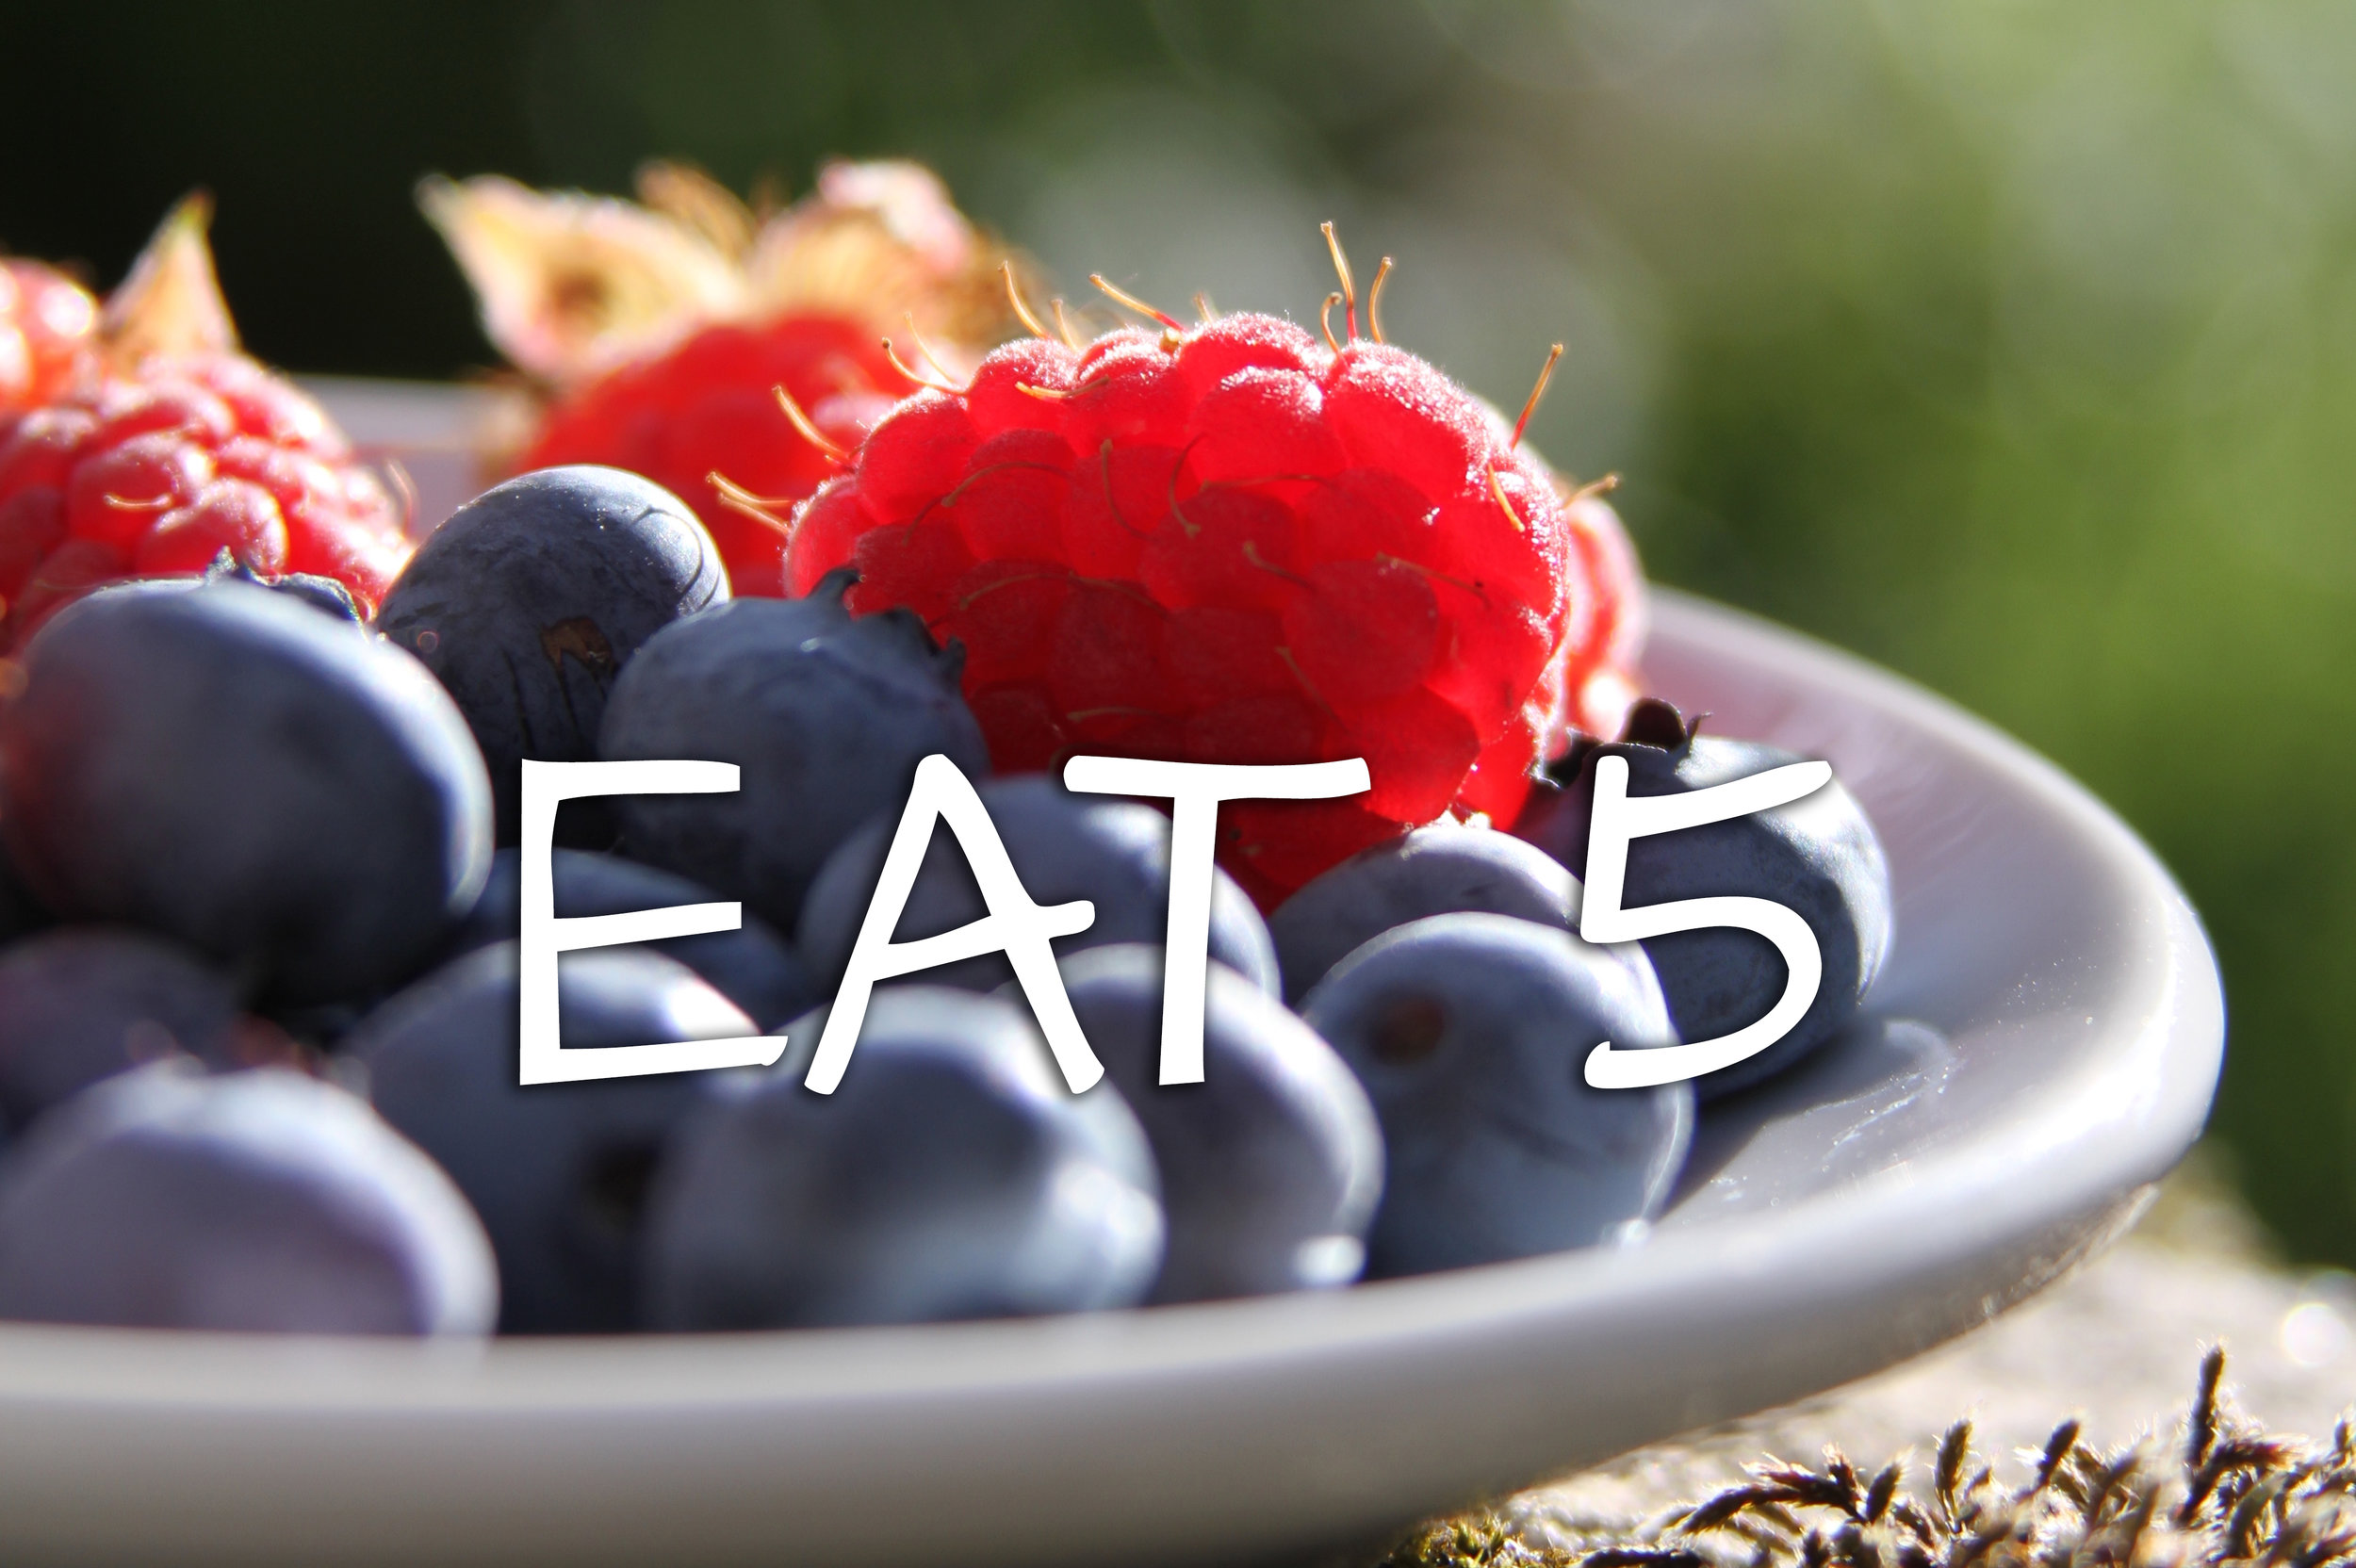 eat5.jpg